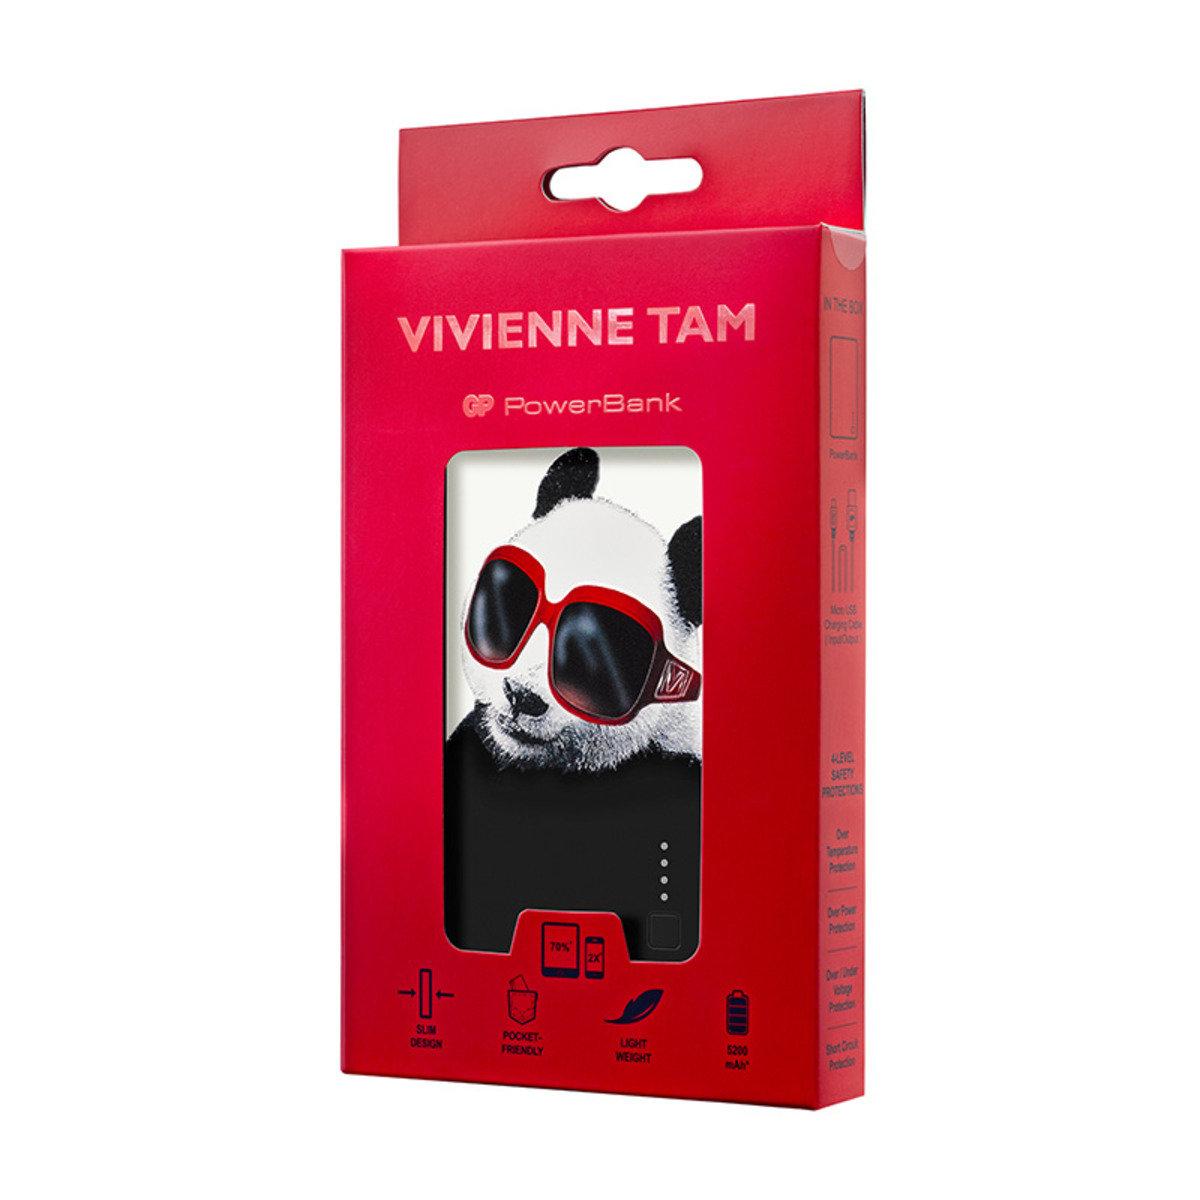 Vivienne Tam x GP 限量版儲電寶 PowerBank 352PB 5200mAh - 酷熊貓